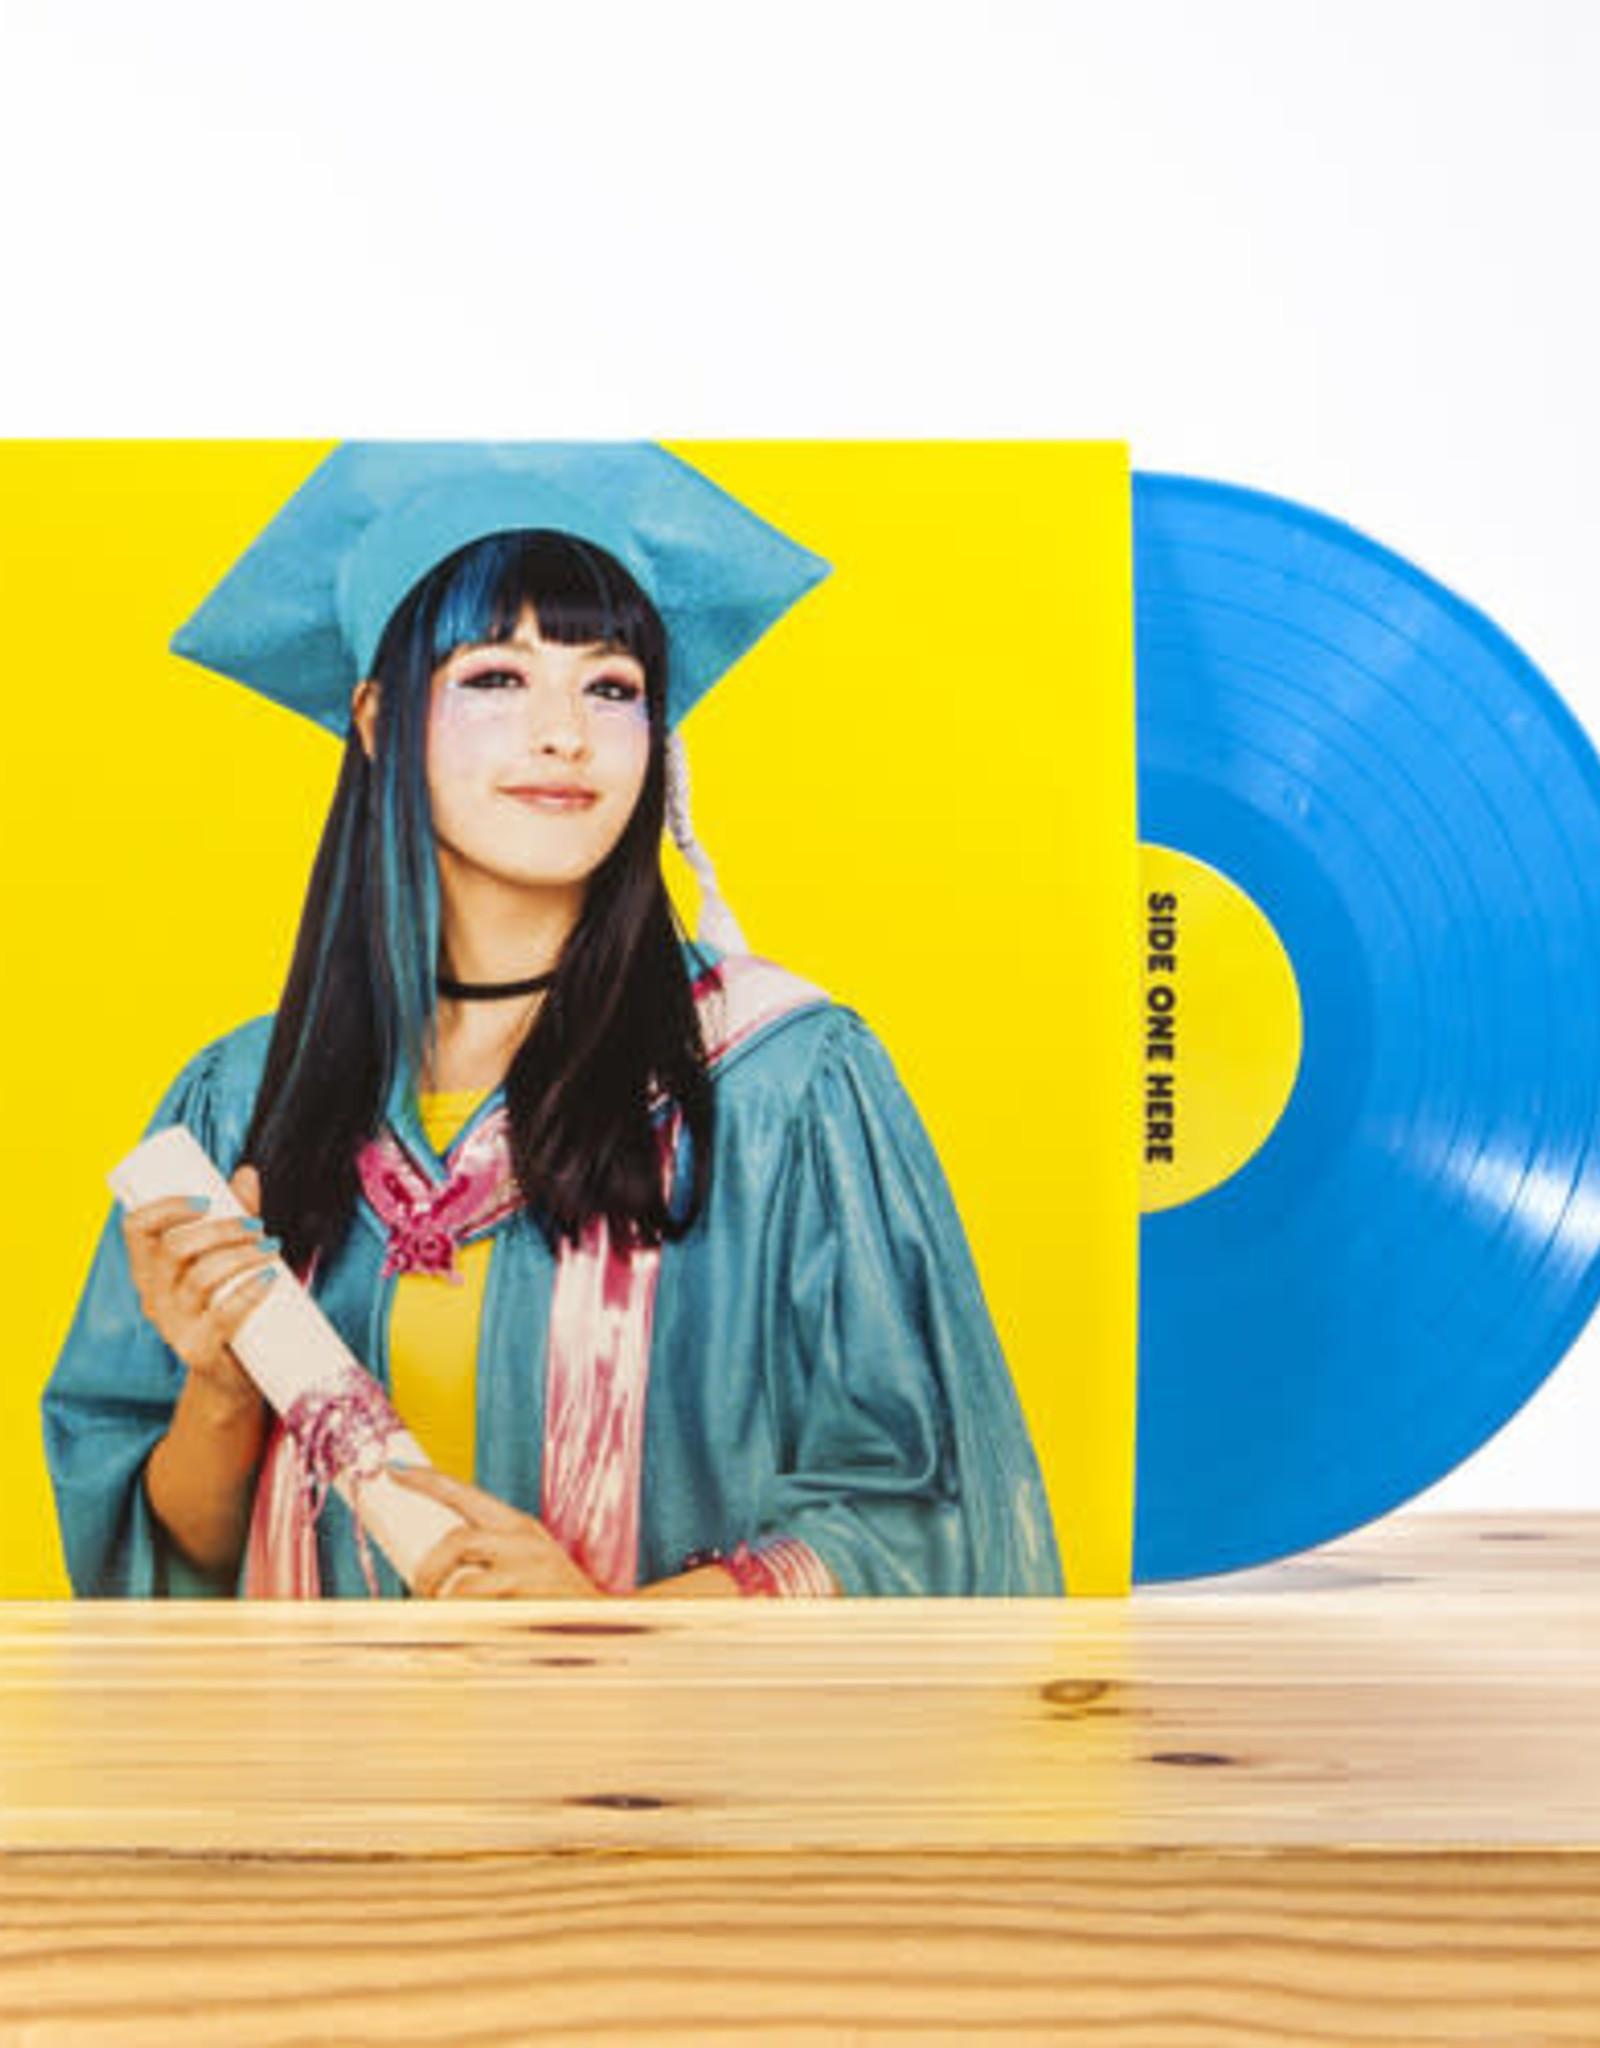 Kero Kero Bonito - Bonito Generation (Color Vinyl)